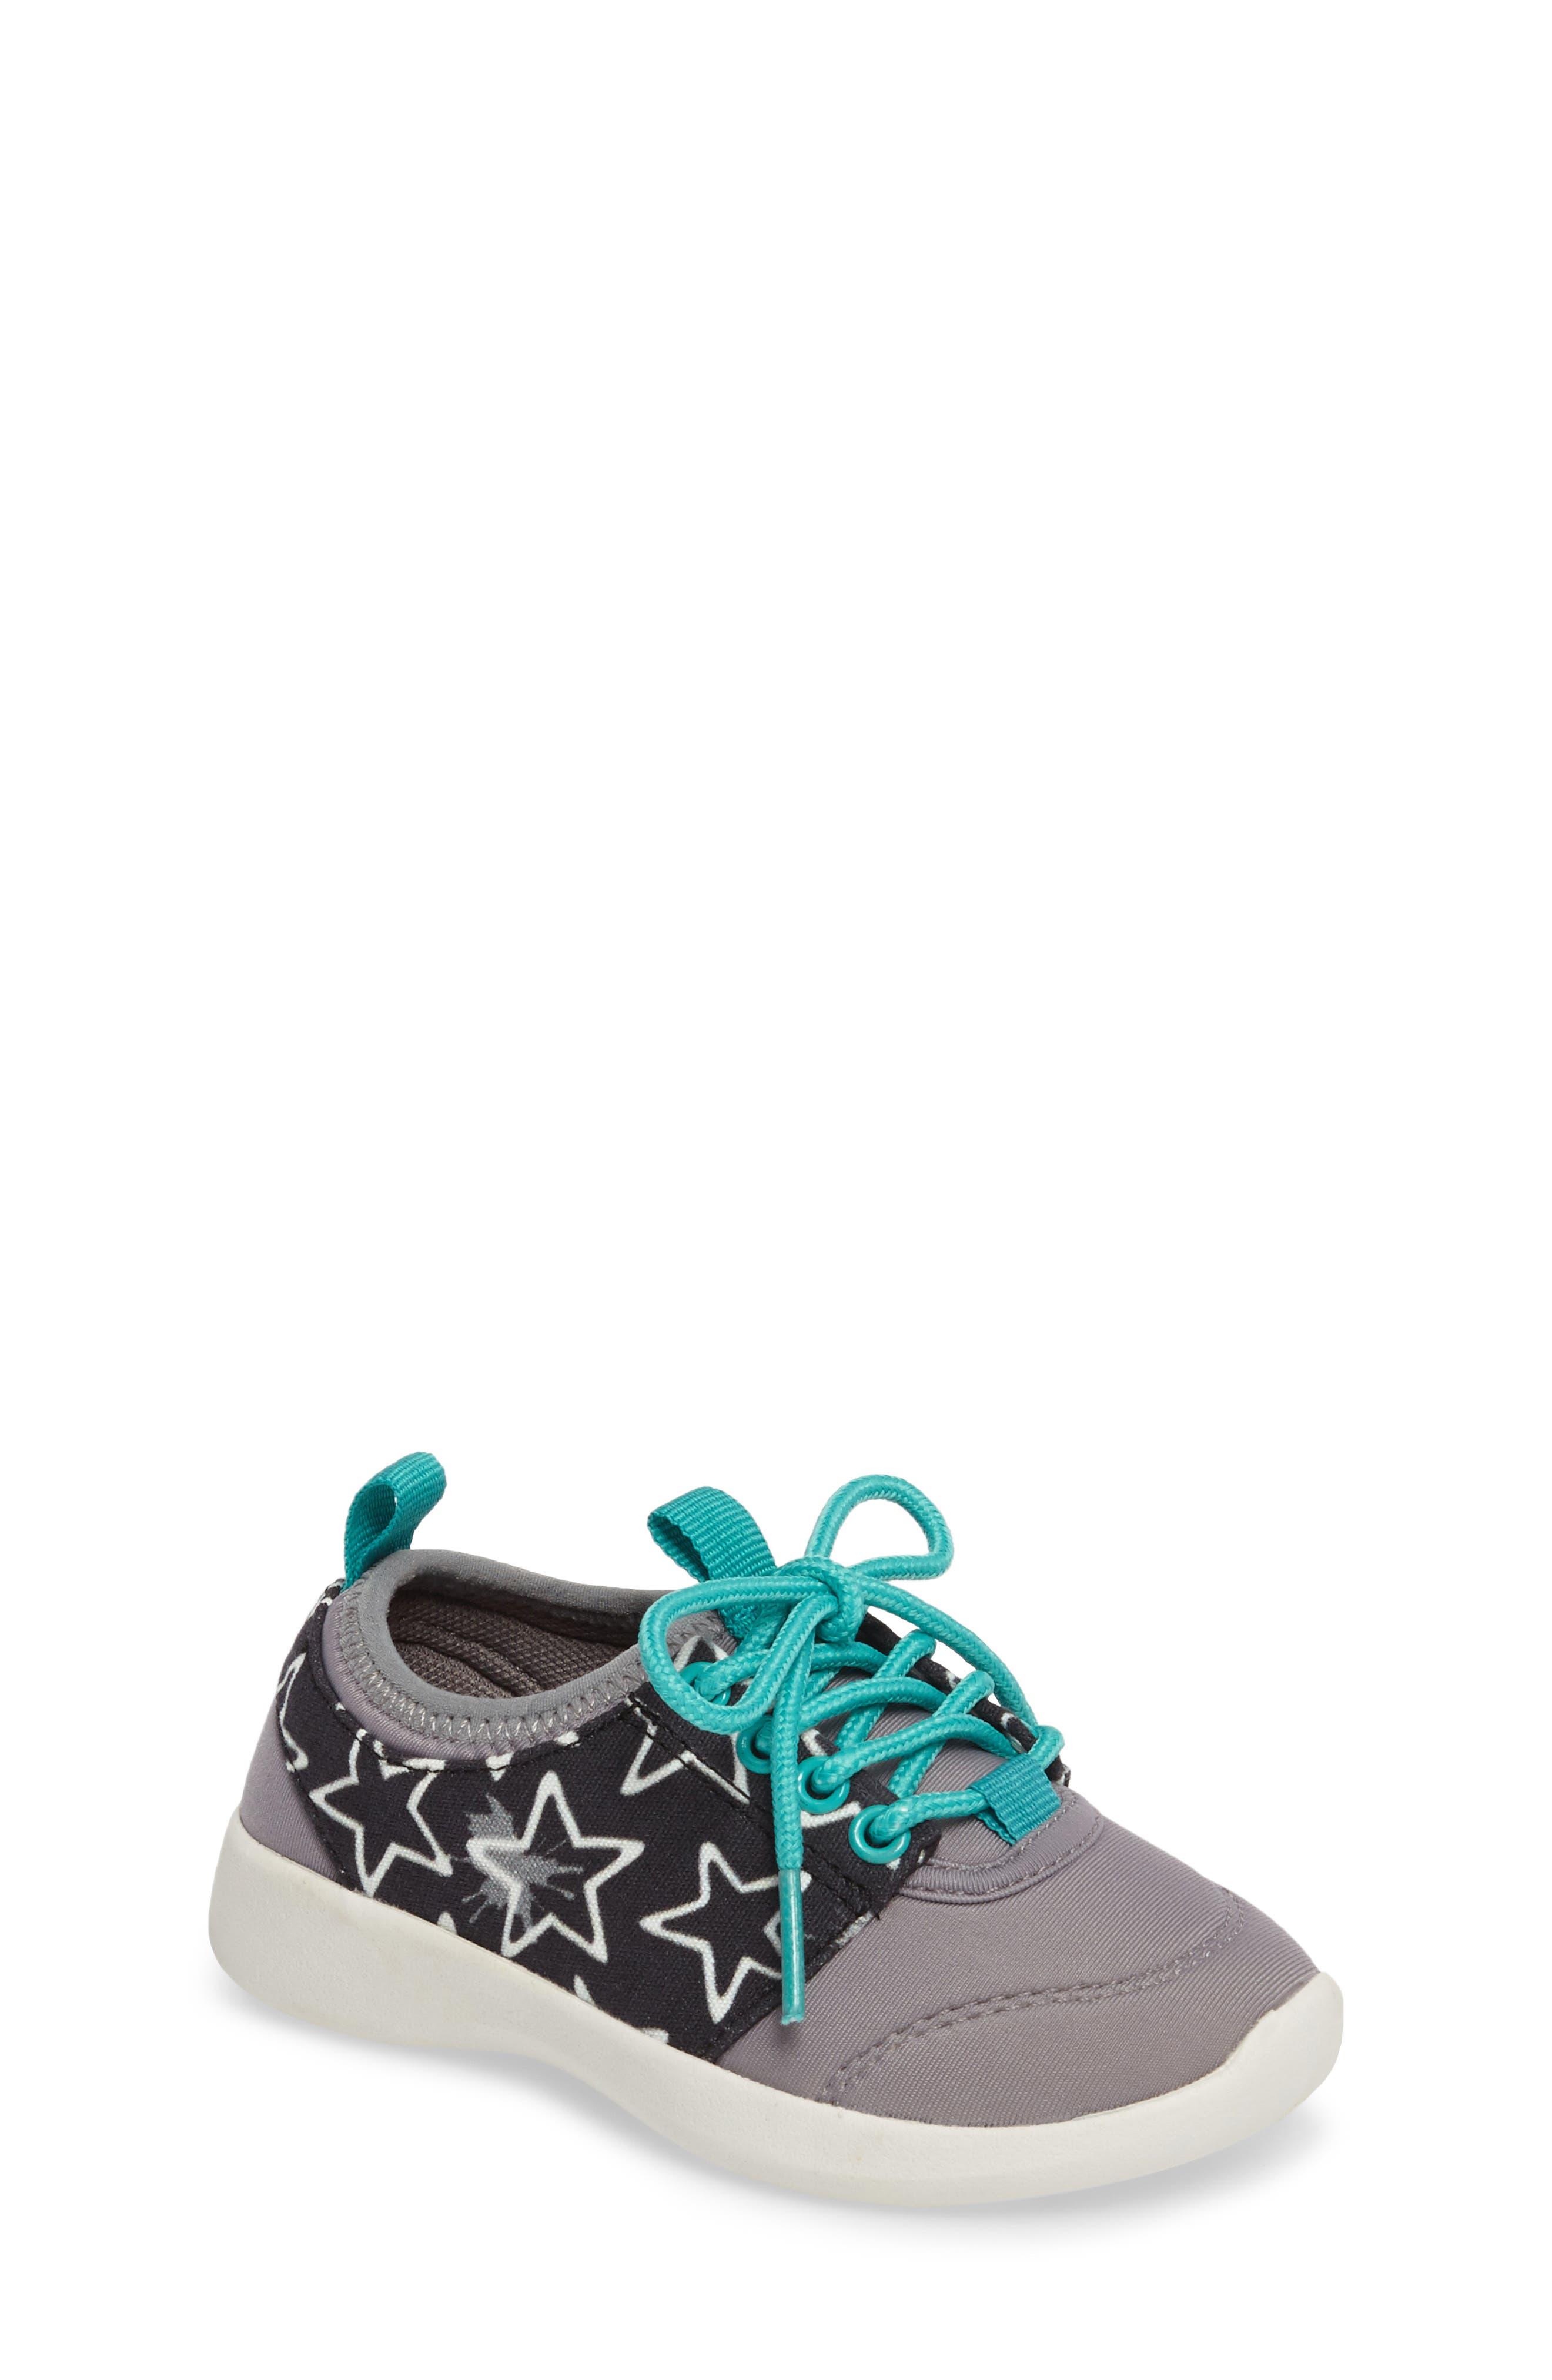 Bolt Sock-Fit Sneaker,                         Main,                         color, 001